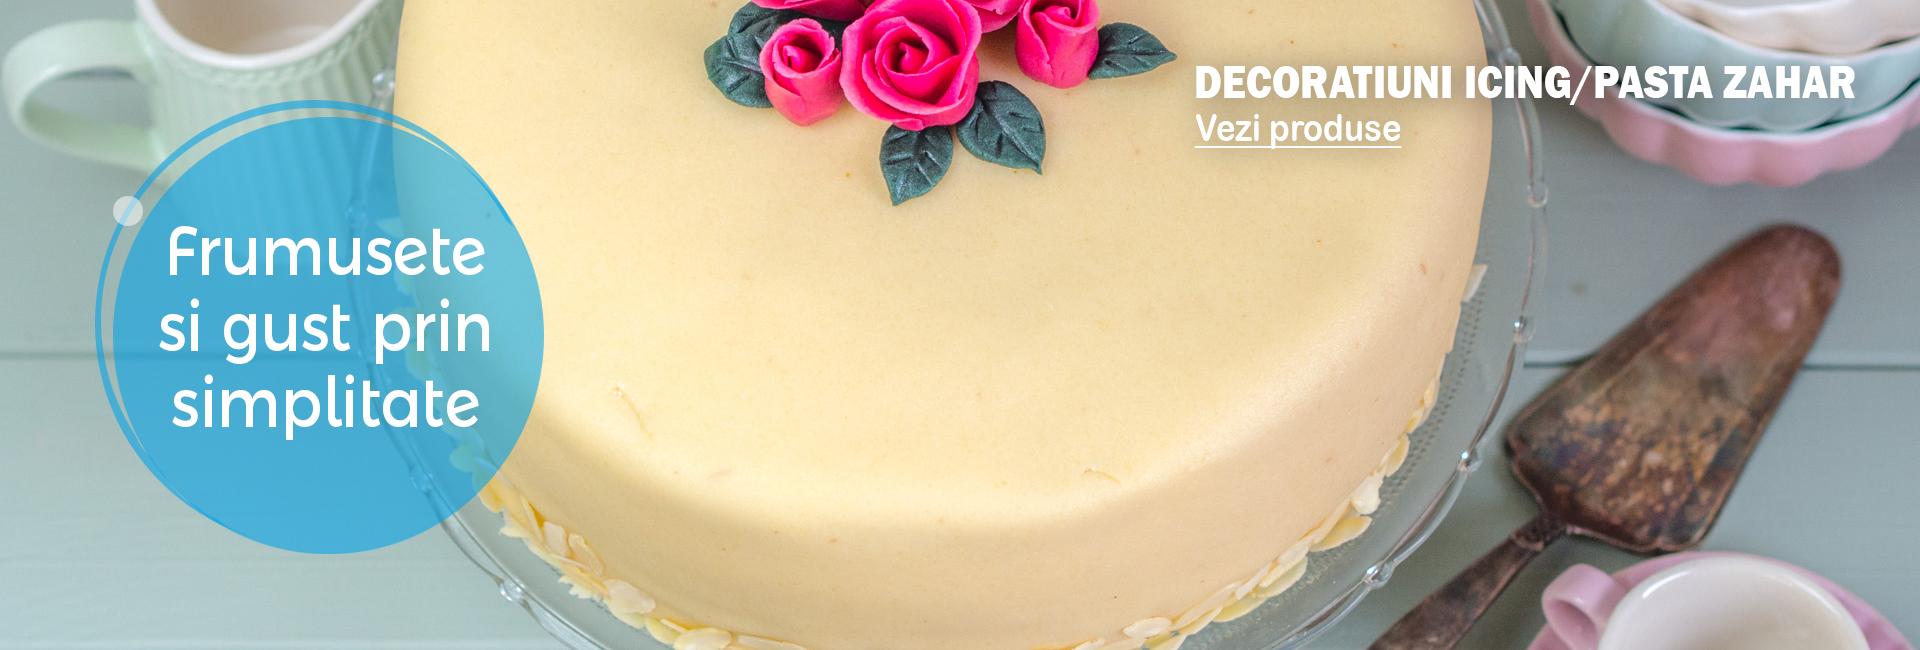 Decoratiuni Icing/Pasta zahar